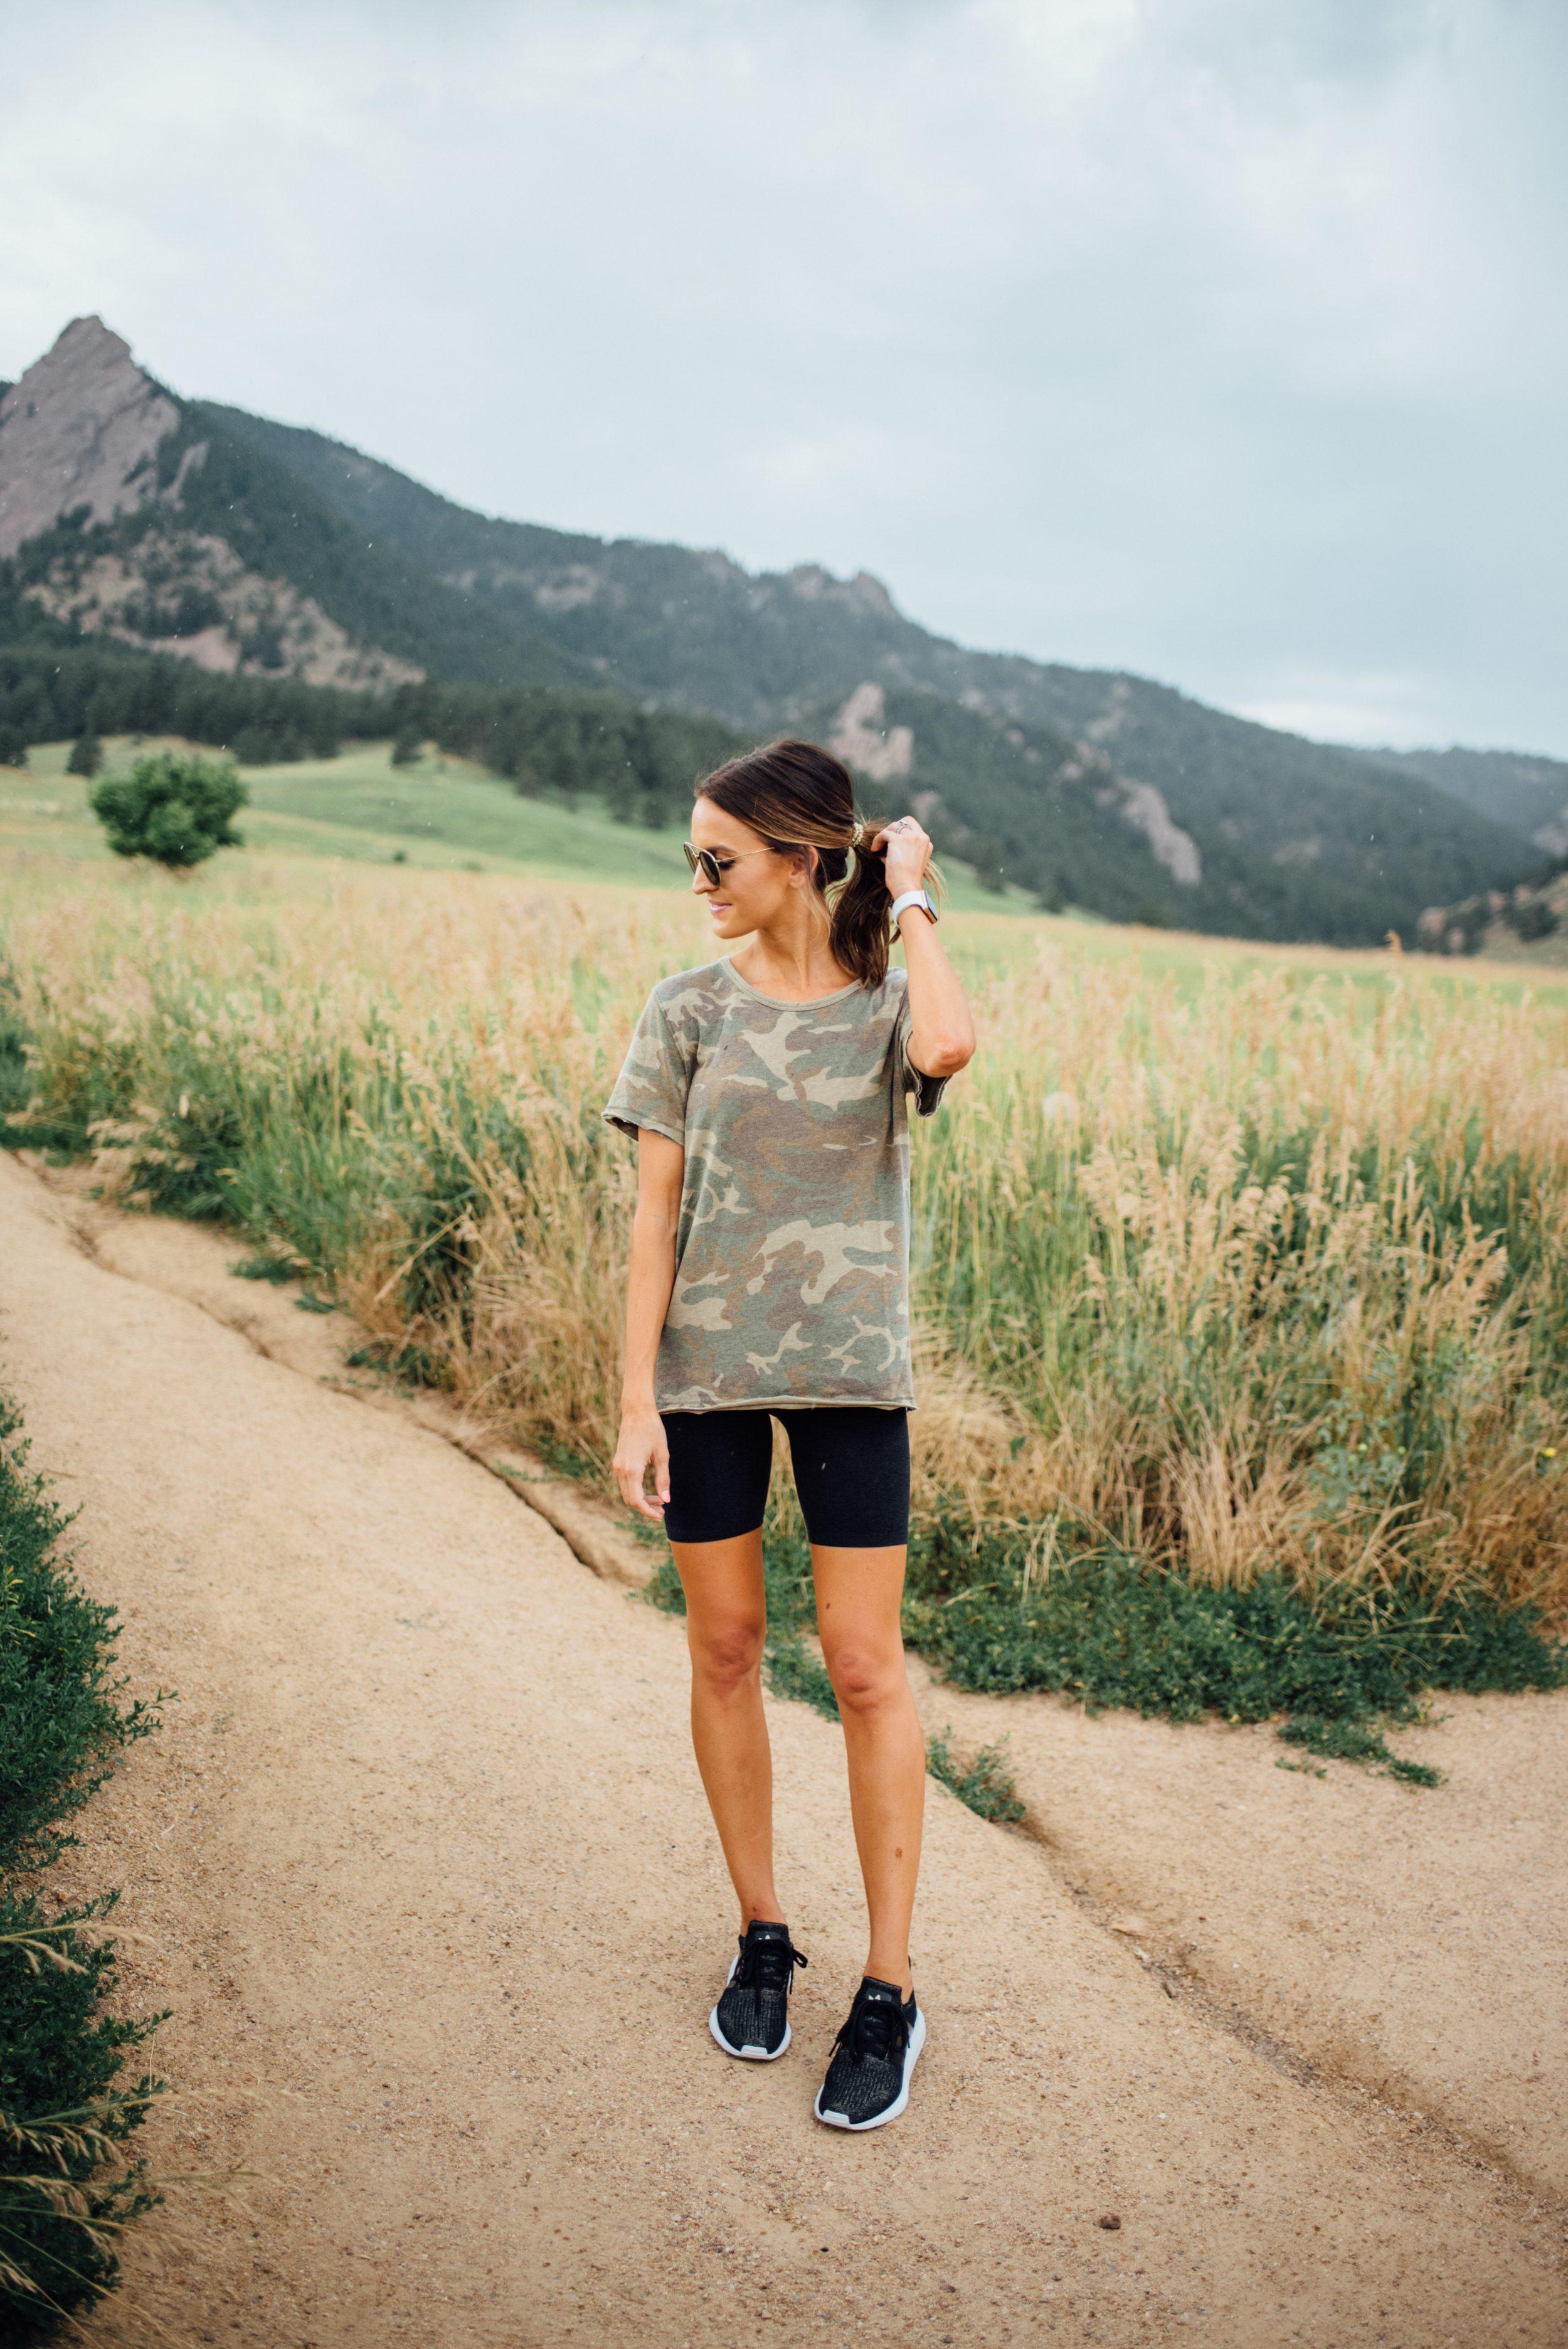 lauren sims best baby carrier hiking backpack